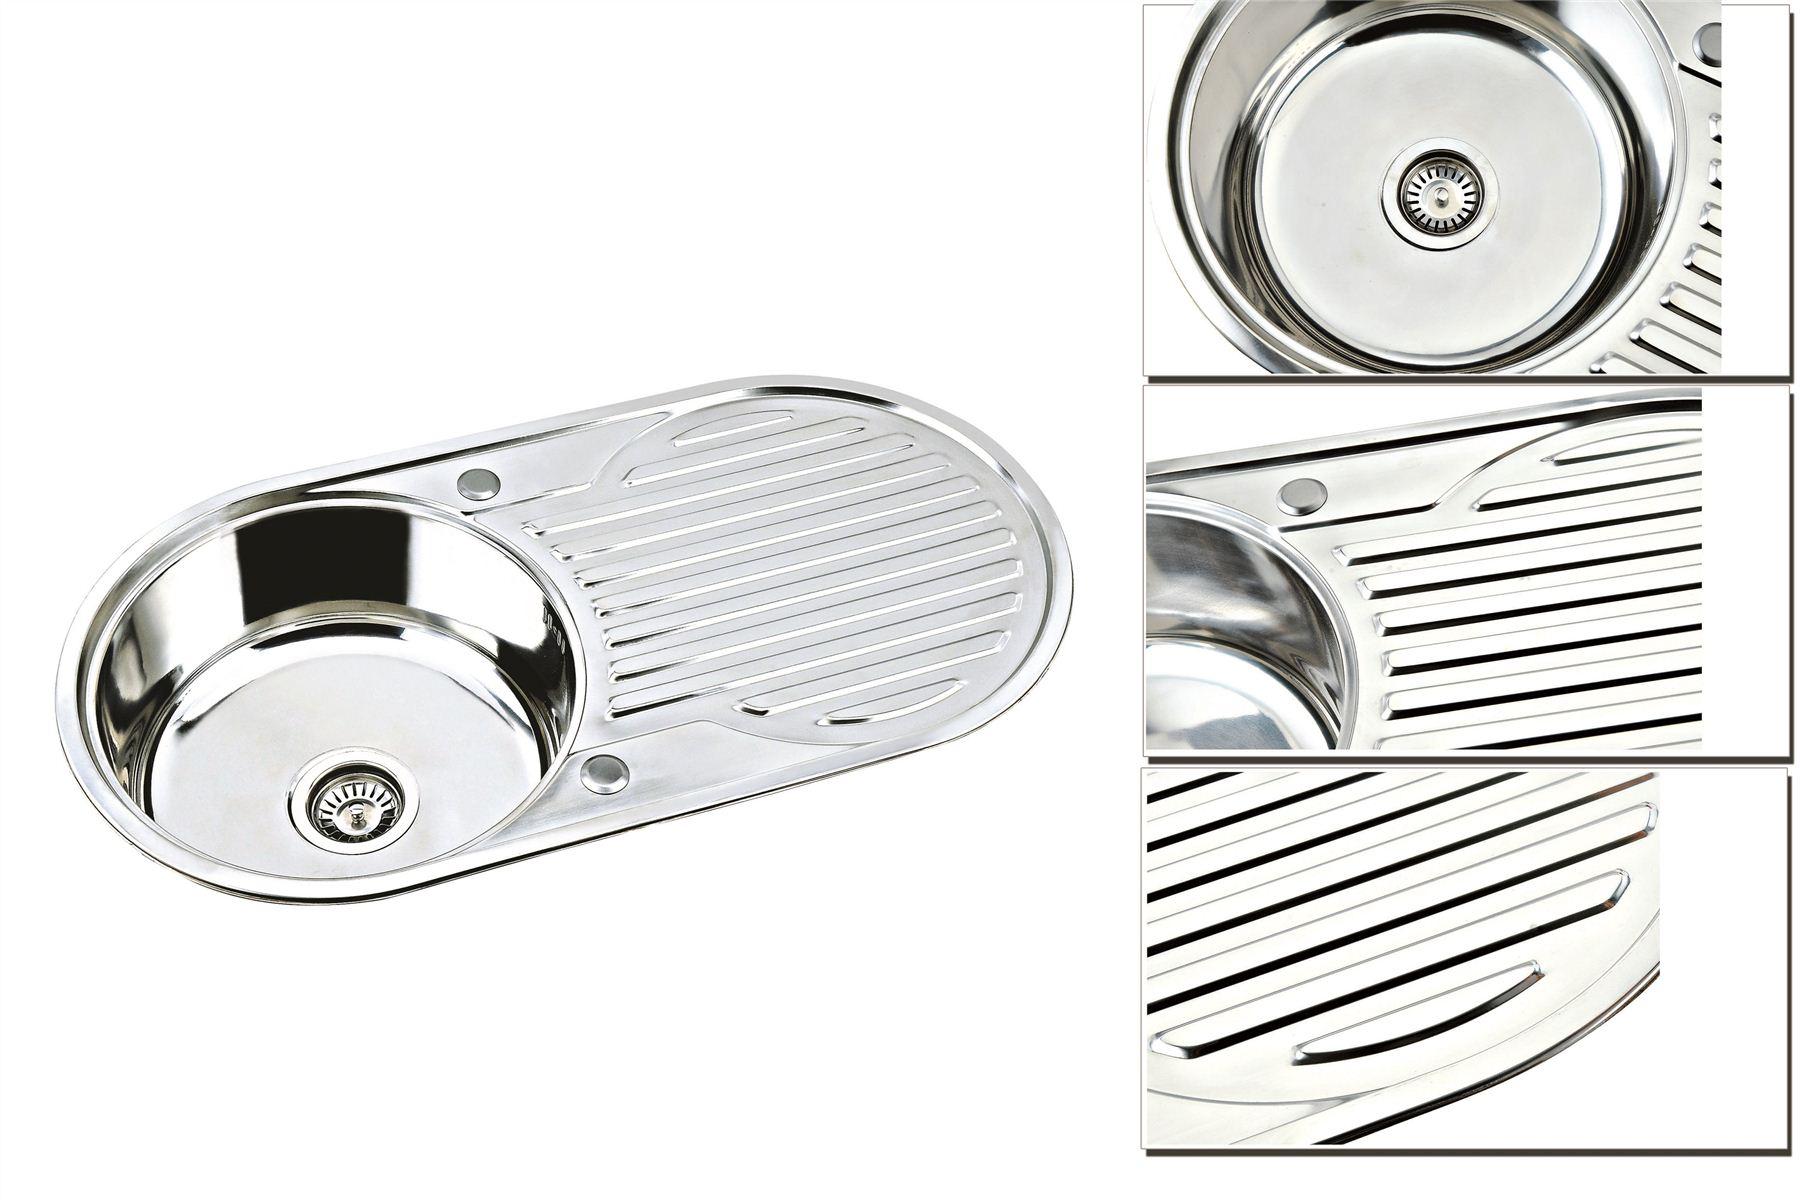 New Stainless Steel Kitchen Sink & Waste Single 1.0, 1.5 & 2.0 Bowl & Round Bowl